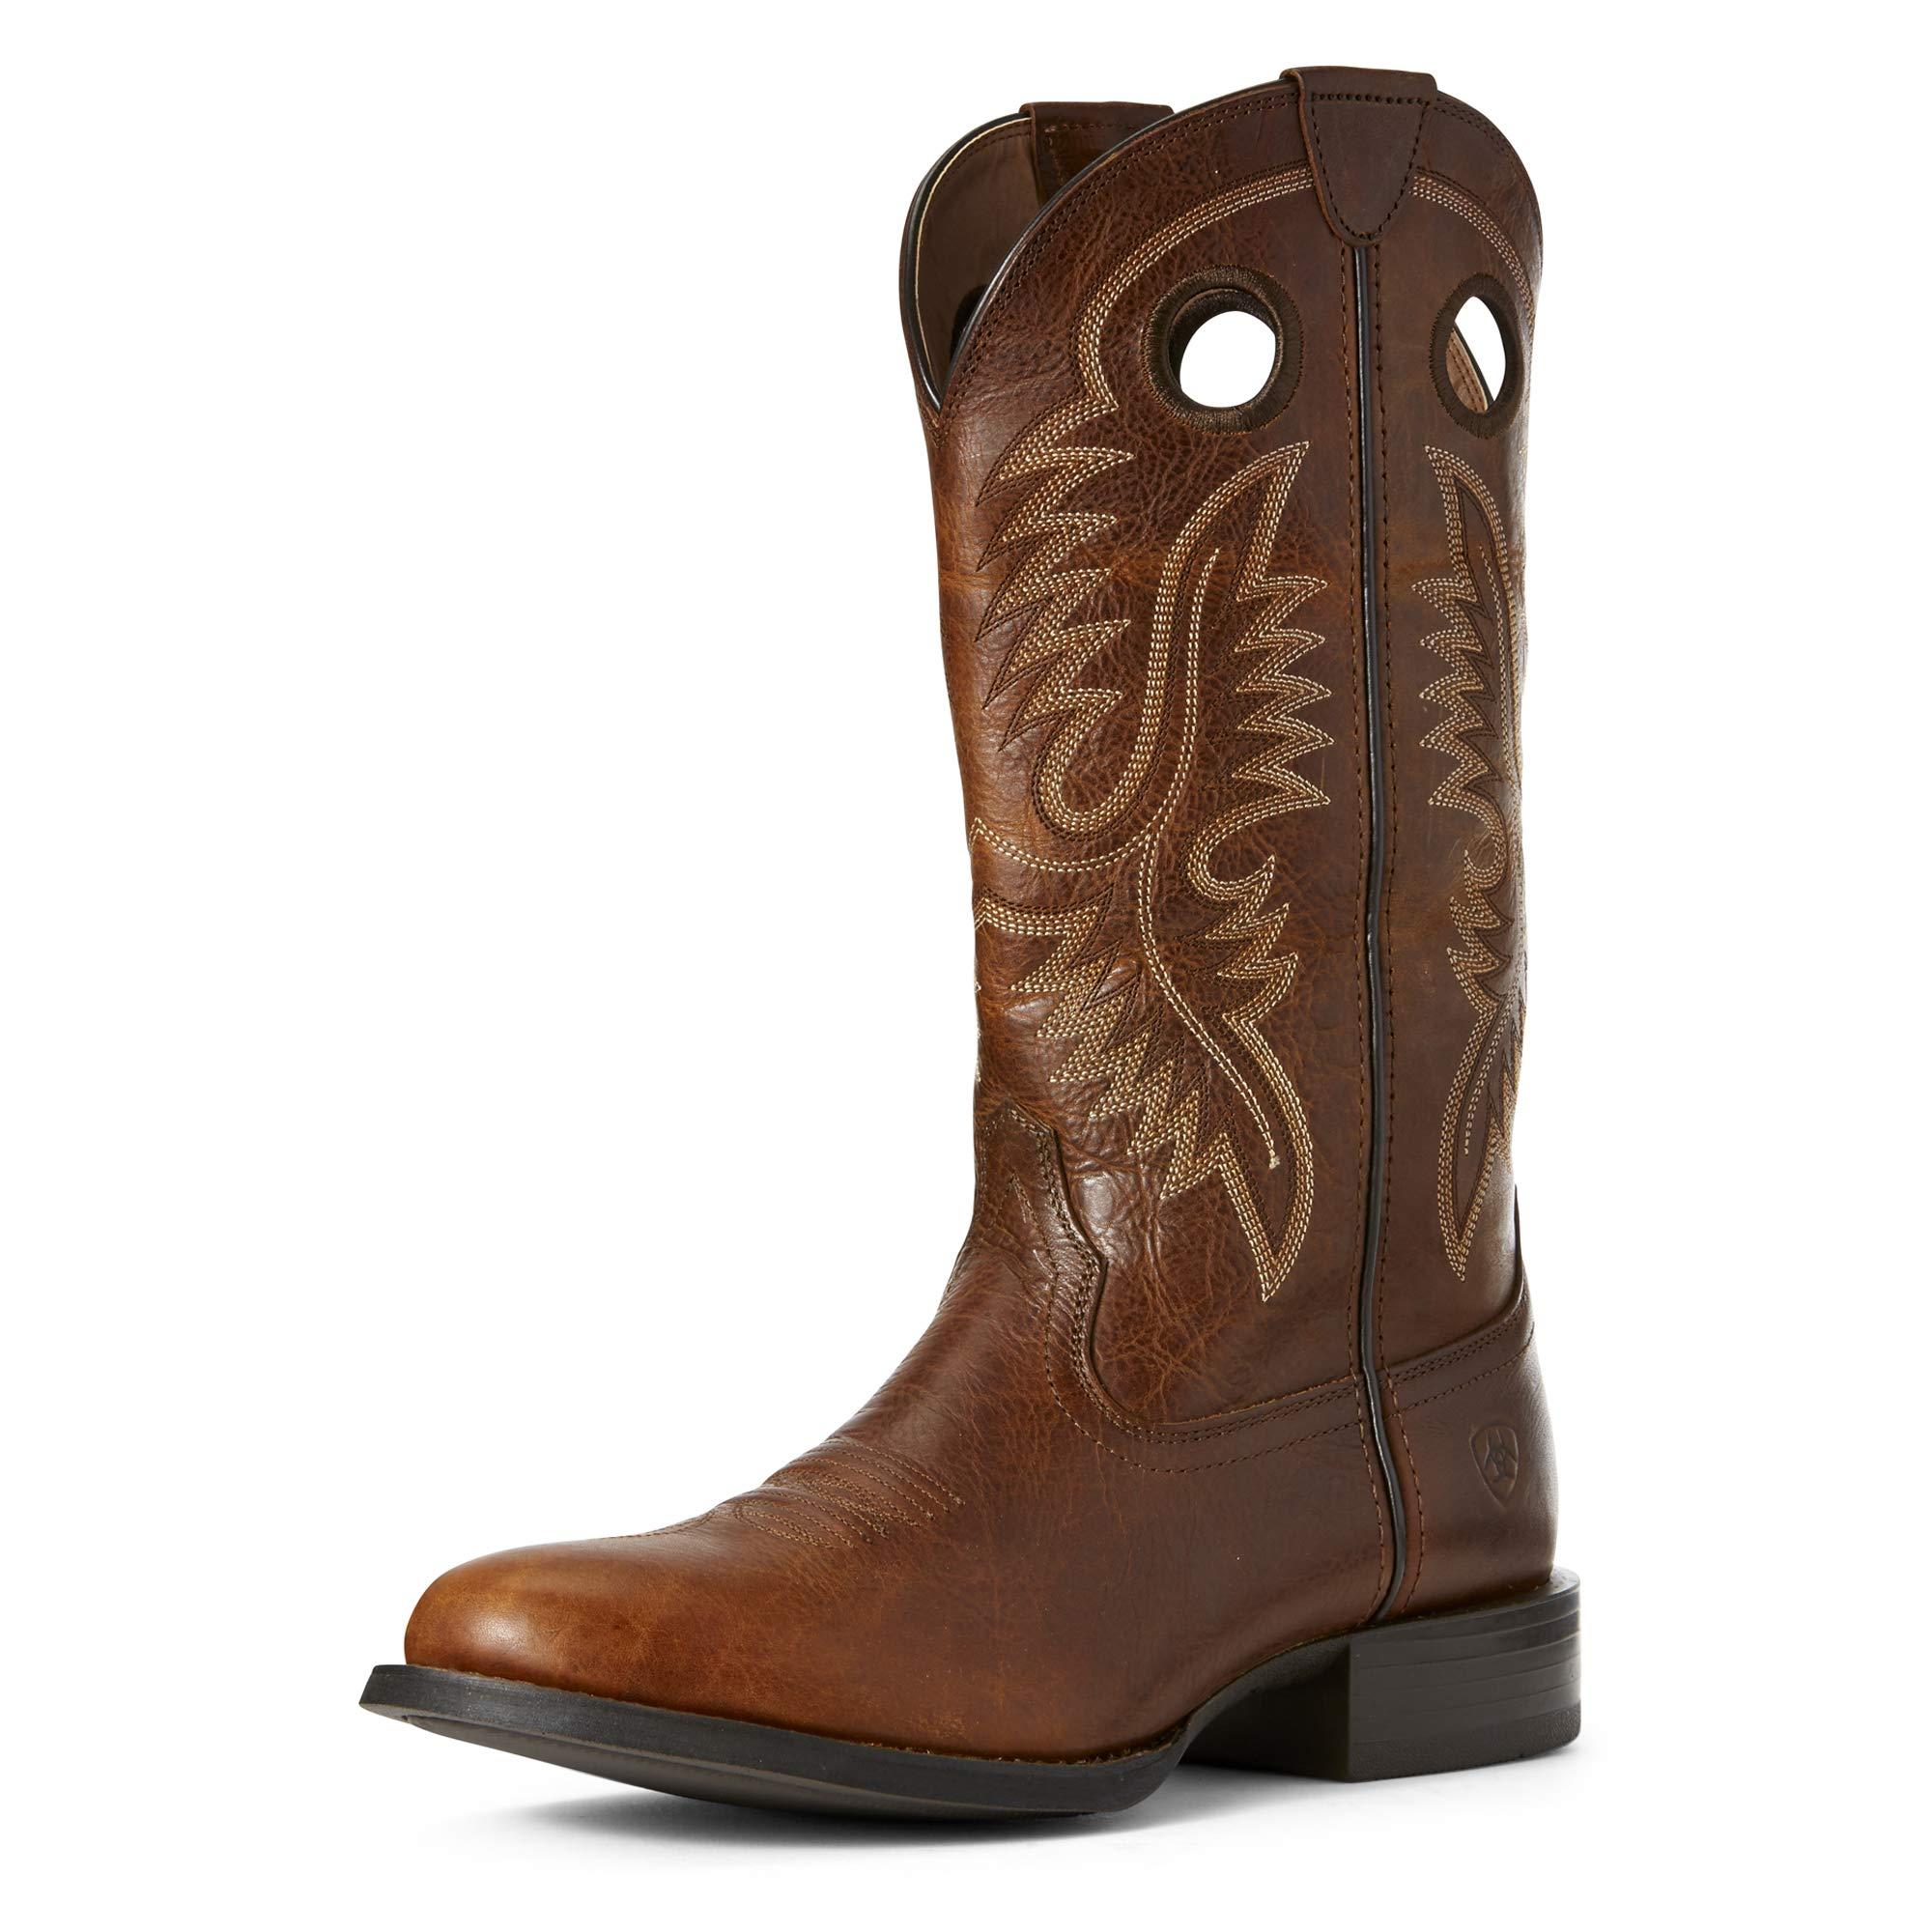 Ariat Men's Sport Big Hoss Western Boot, Brown Patina, 13D by ARIAT